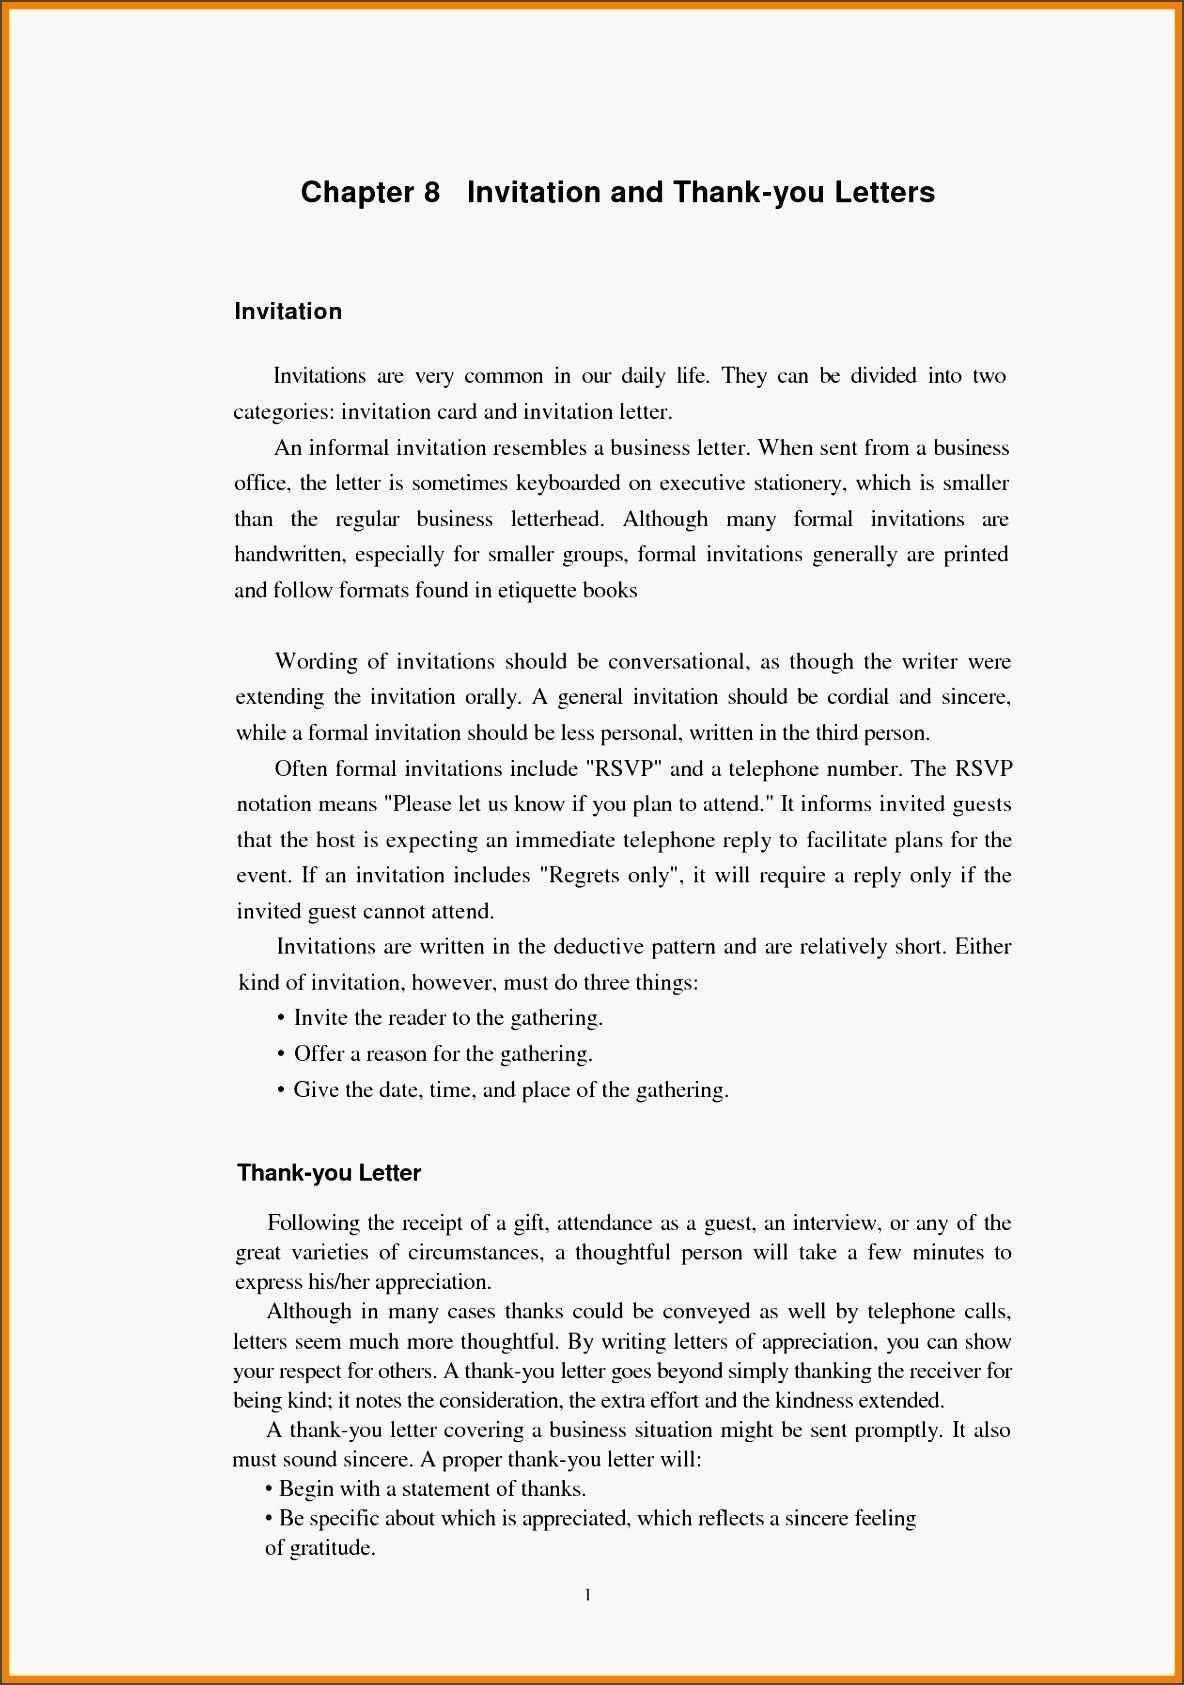 27 The Best Formal Invitation Letter Samples Photo with Formal Invitation  Letter Samples - Cards Design Templates